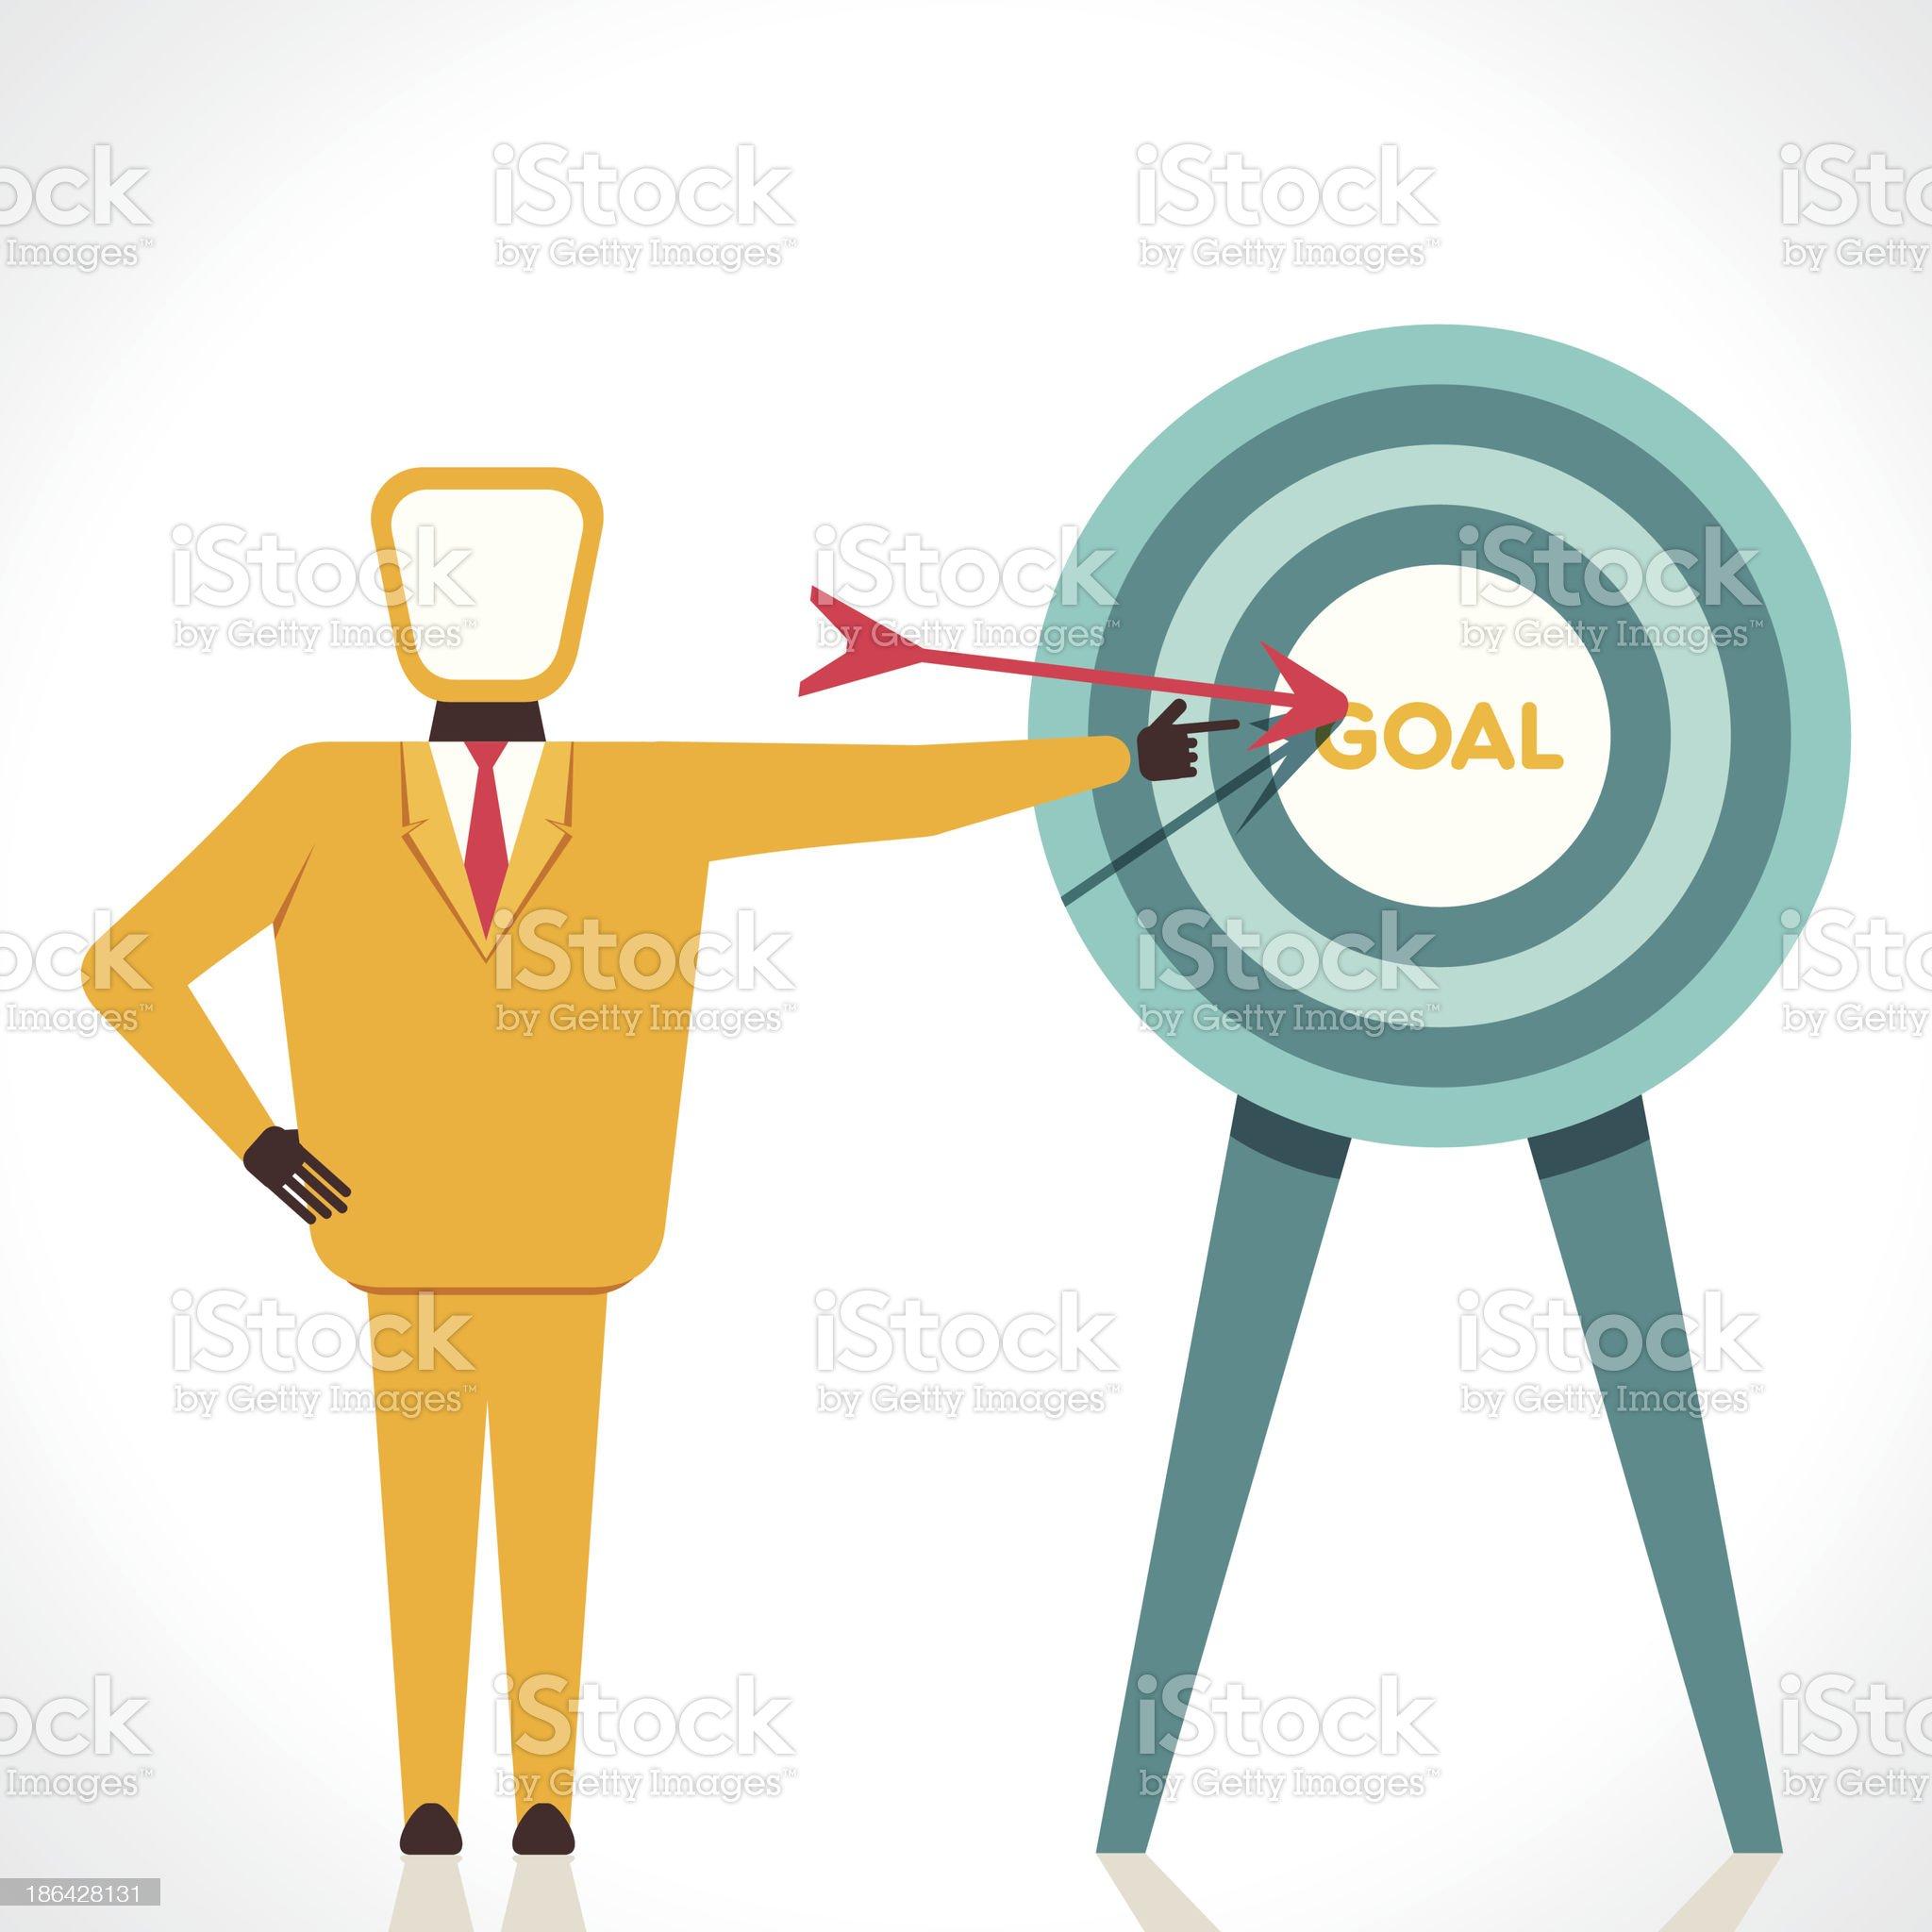 focus on goal royalty-free stock vector art